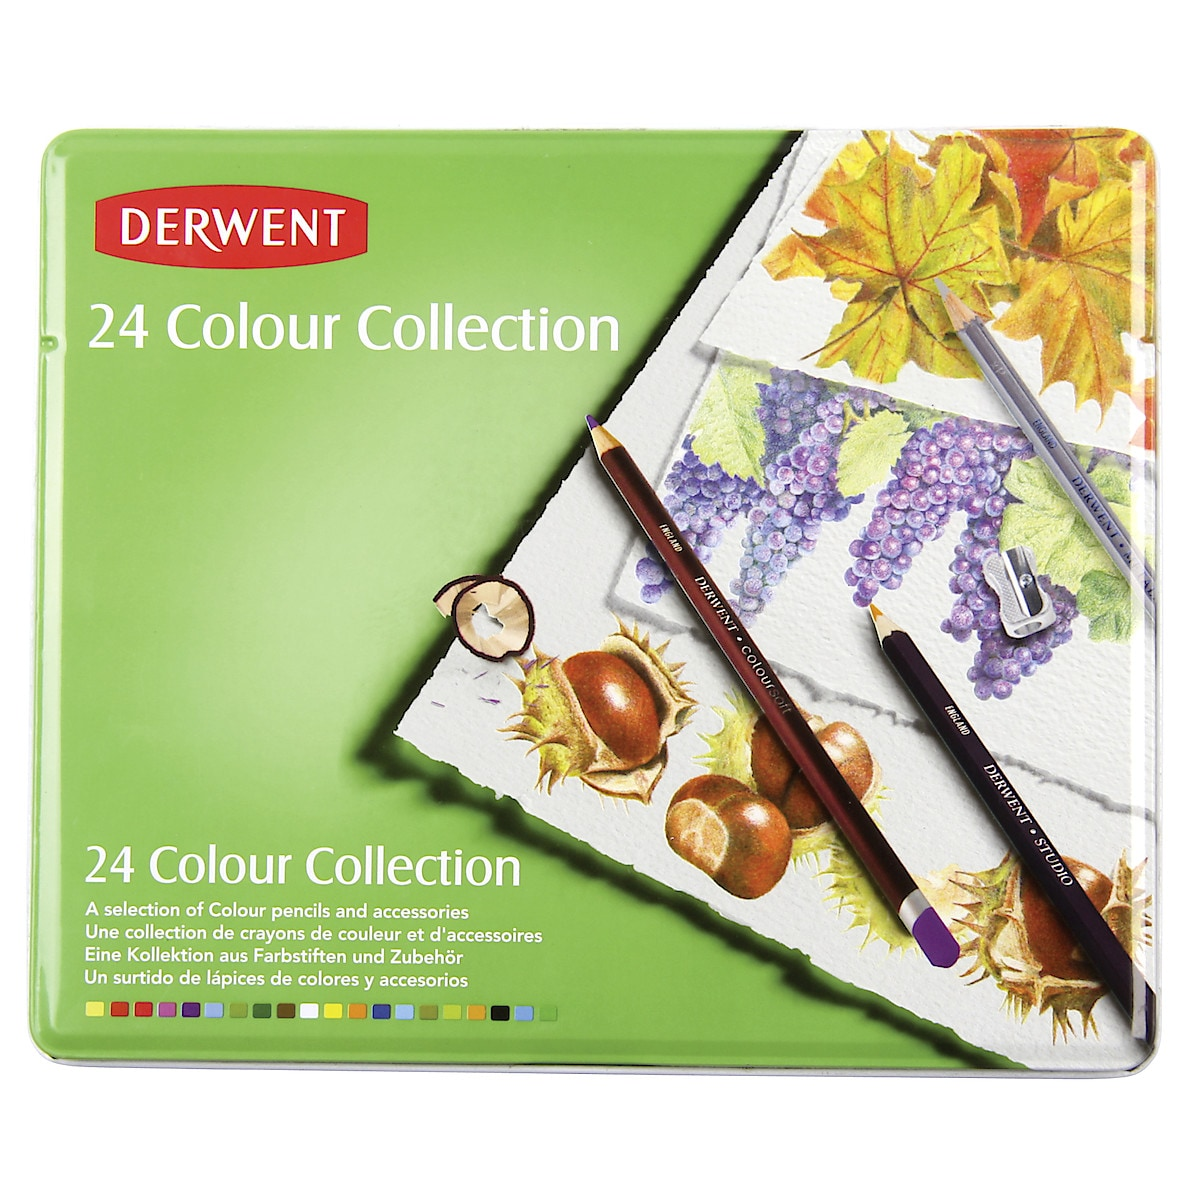 Derwent Coloured Pencil Set